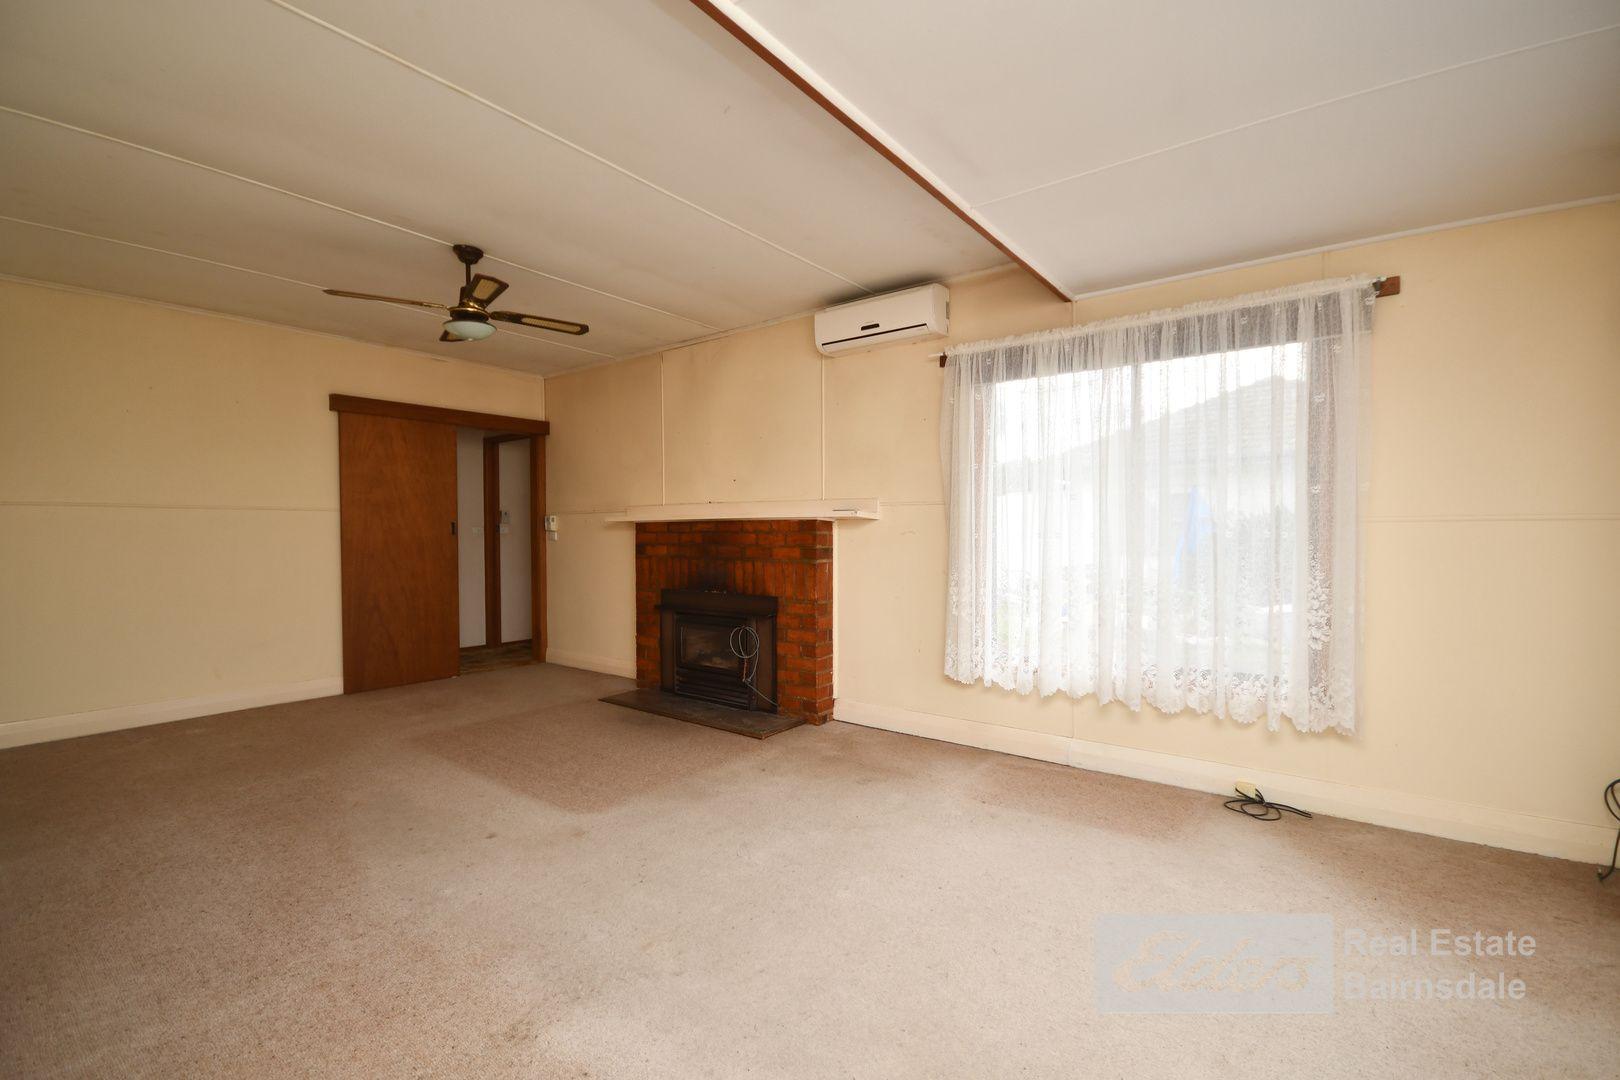 58 Pinnock Street, Bairnsdale VIC 3875, Image 2